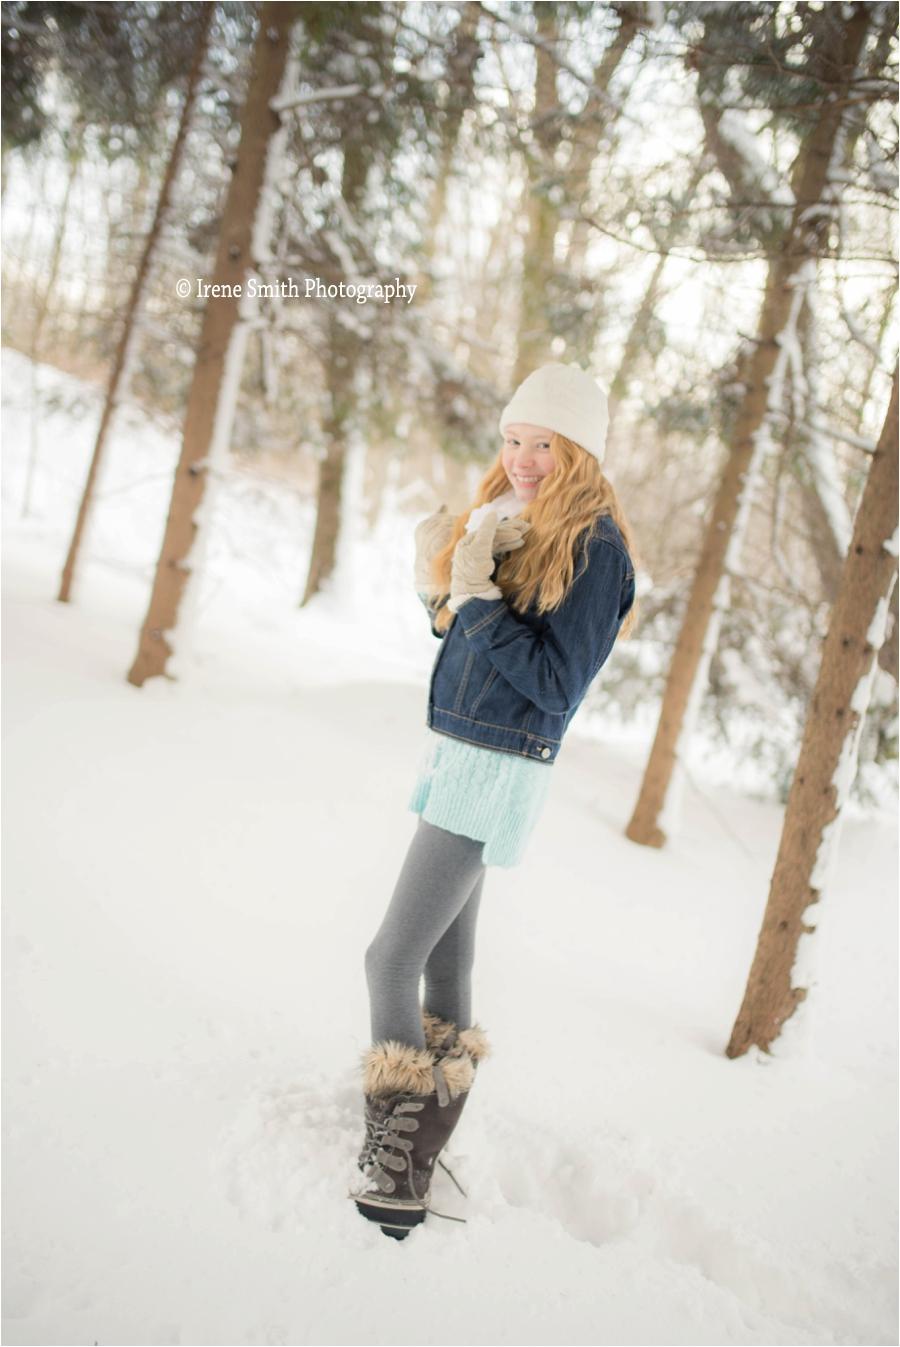 Irene-Smith-Photography-Franklin-Oil-City-Pennsylvania_0039